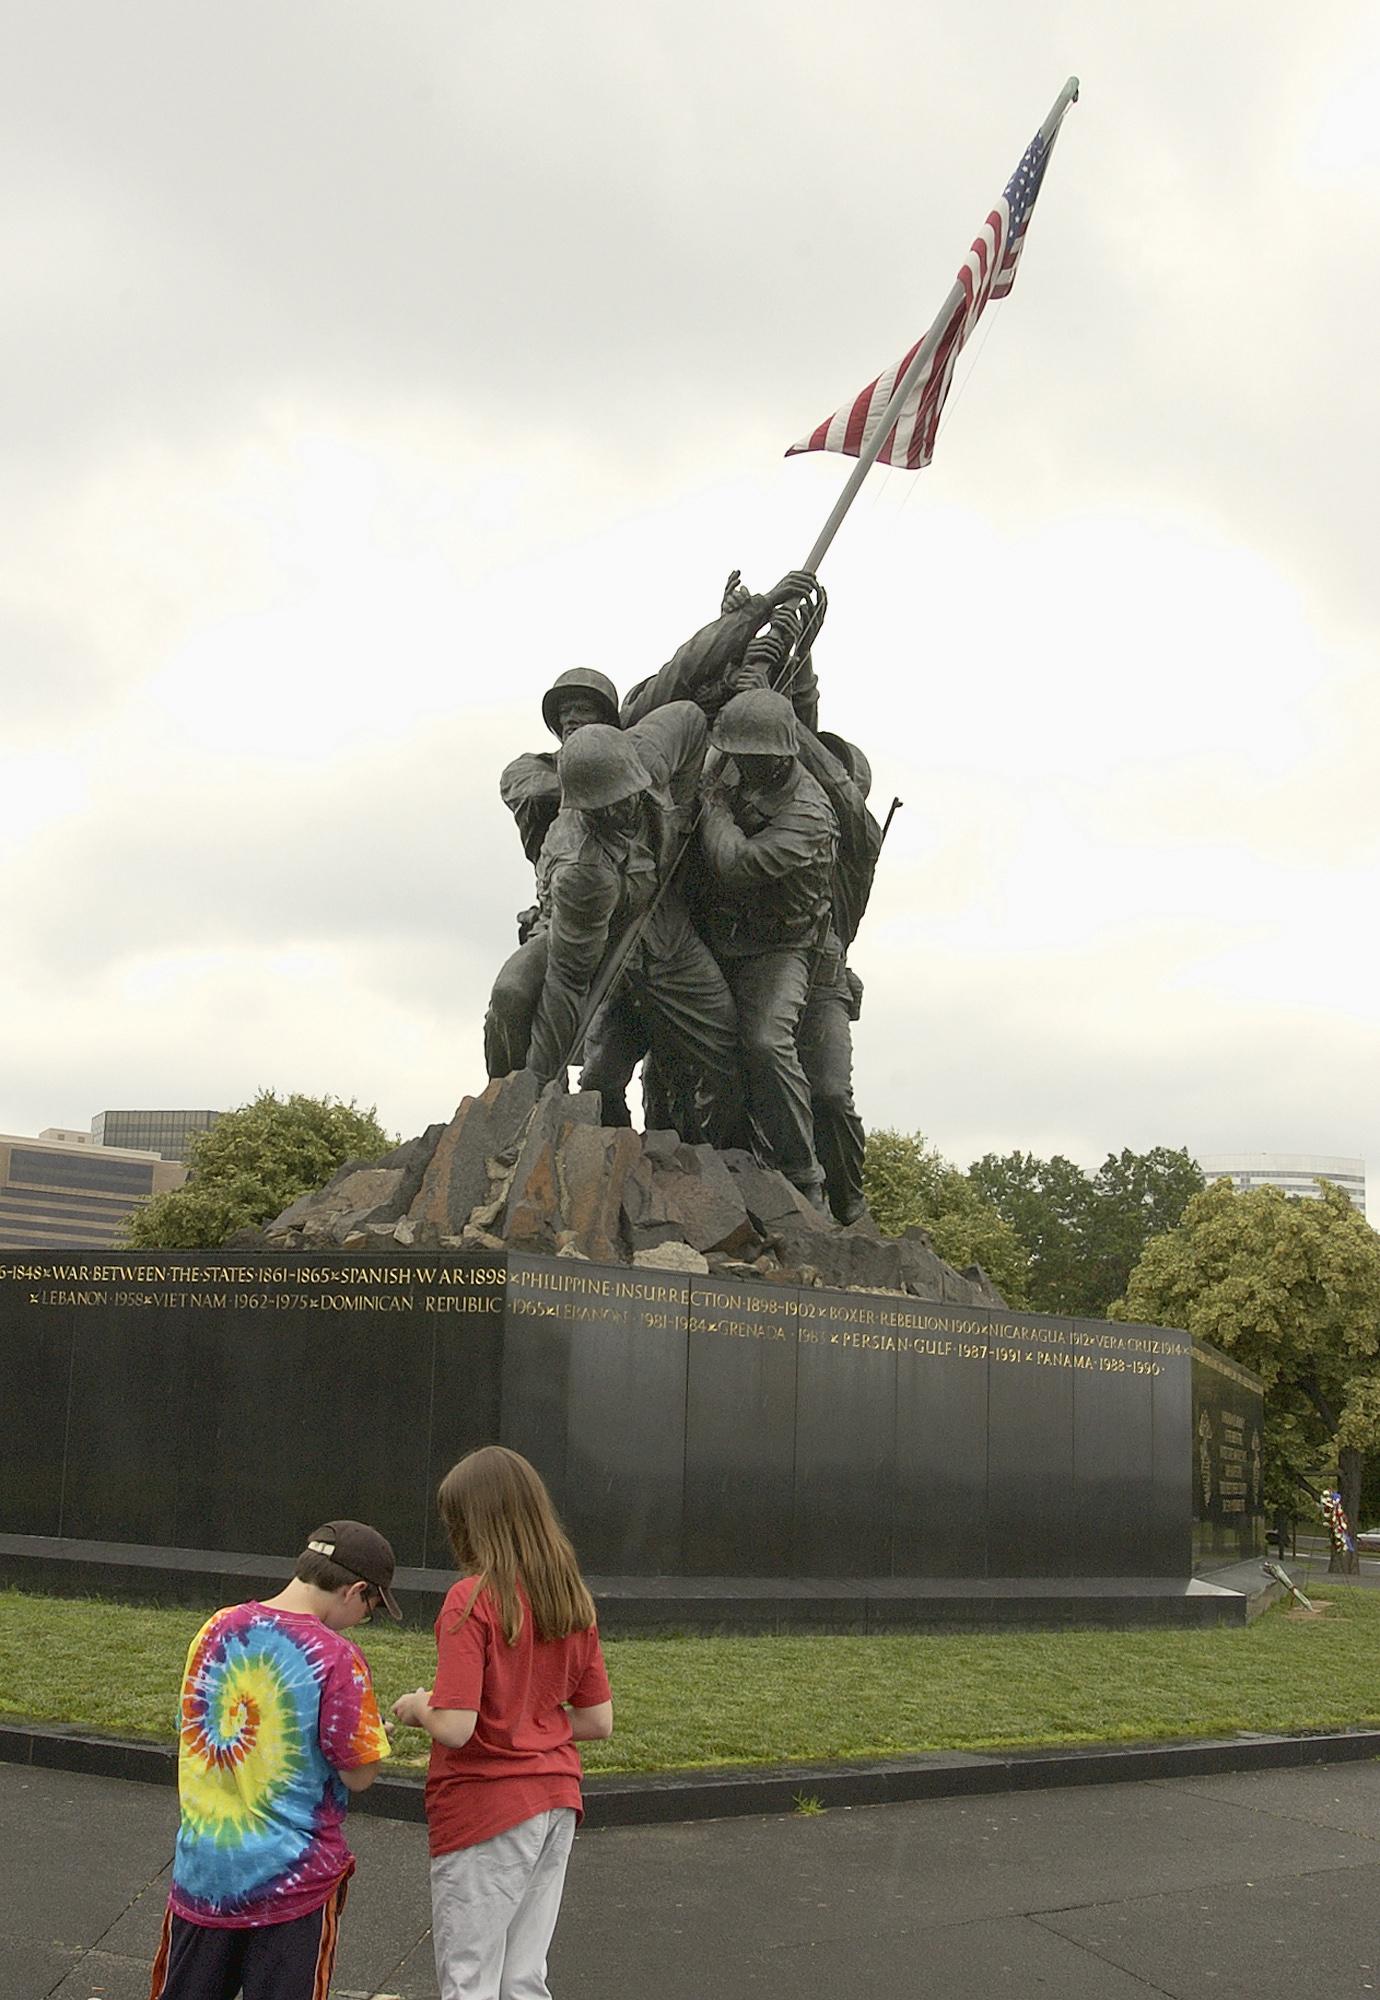 Fileus Navy 030617 N 9593r 088 The Marine Corps War Memorial Stands